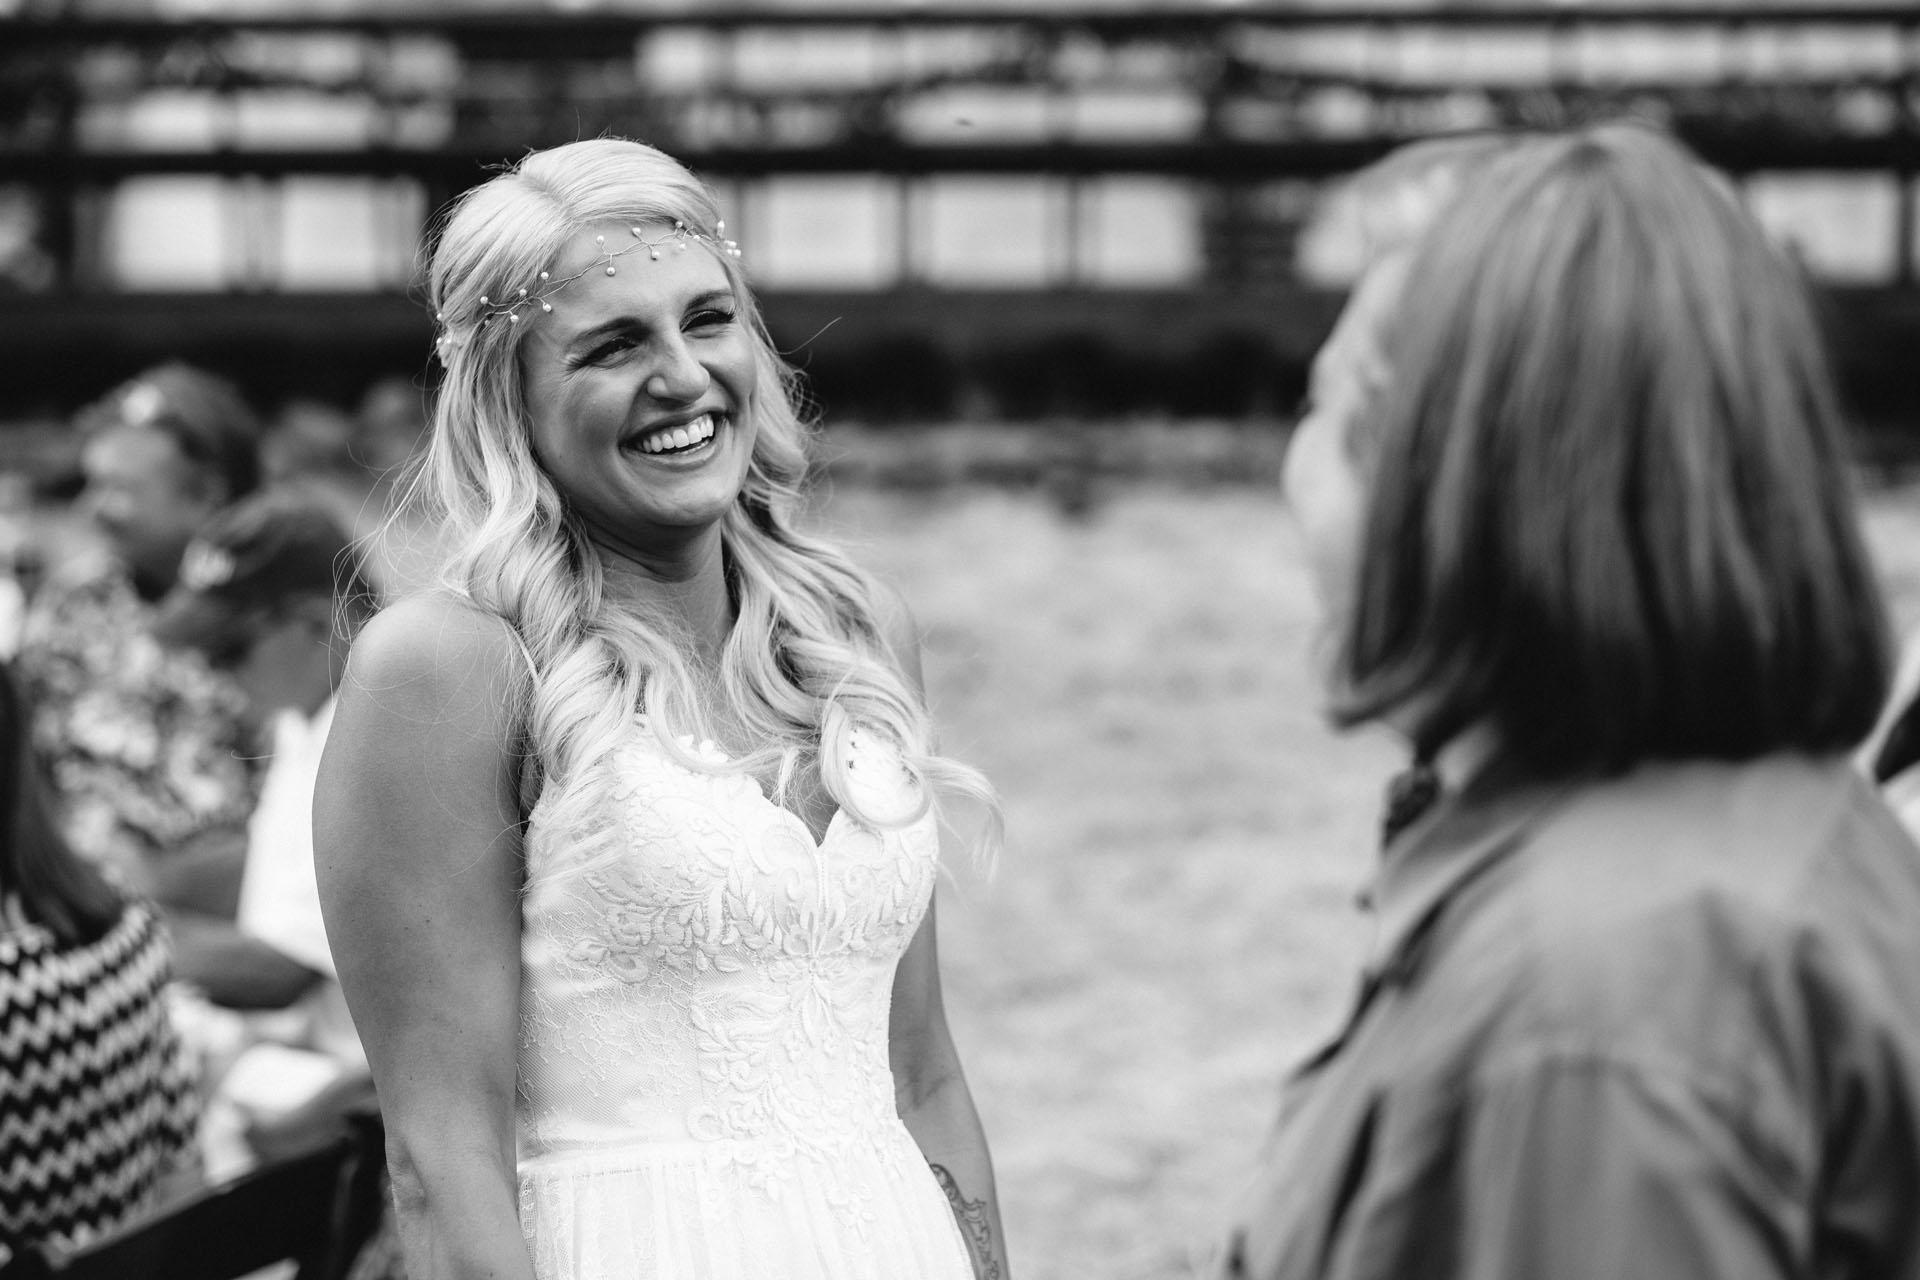 10-7-17 Devon and Jordan's Wedding-167.jpg